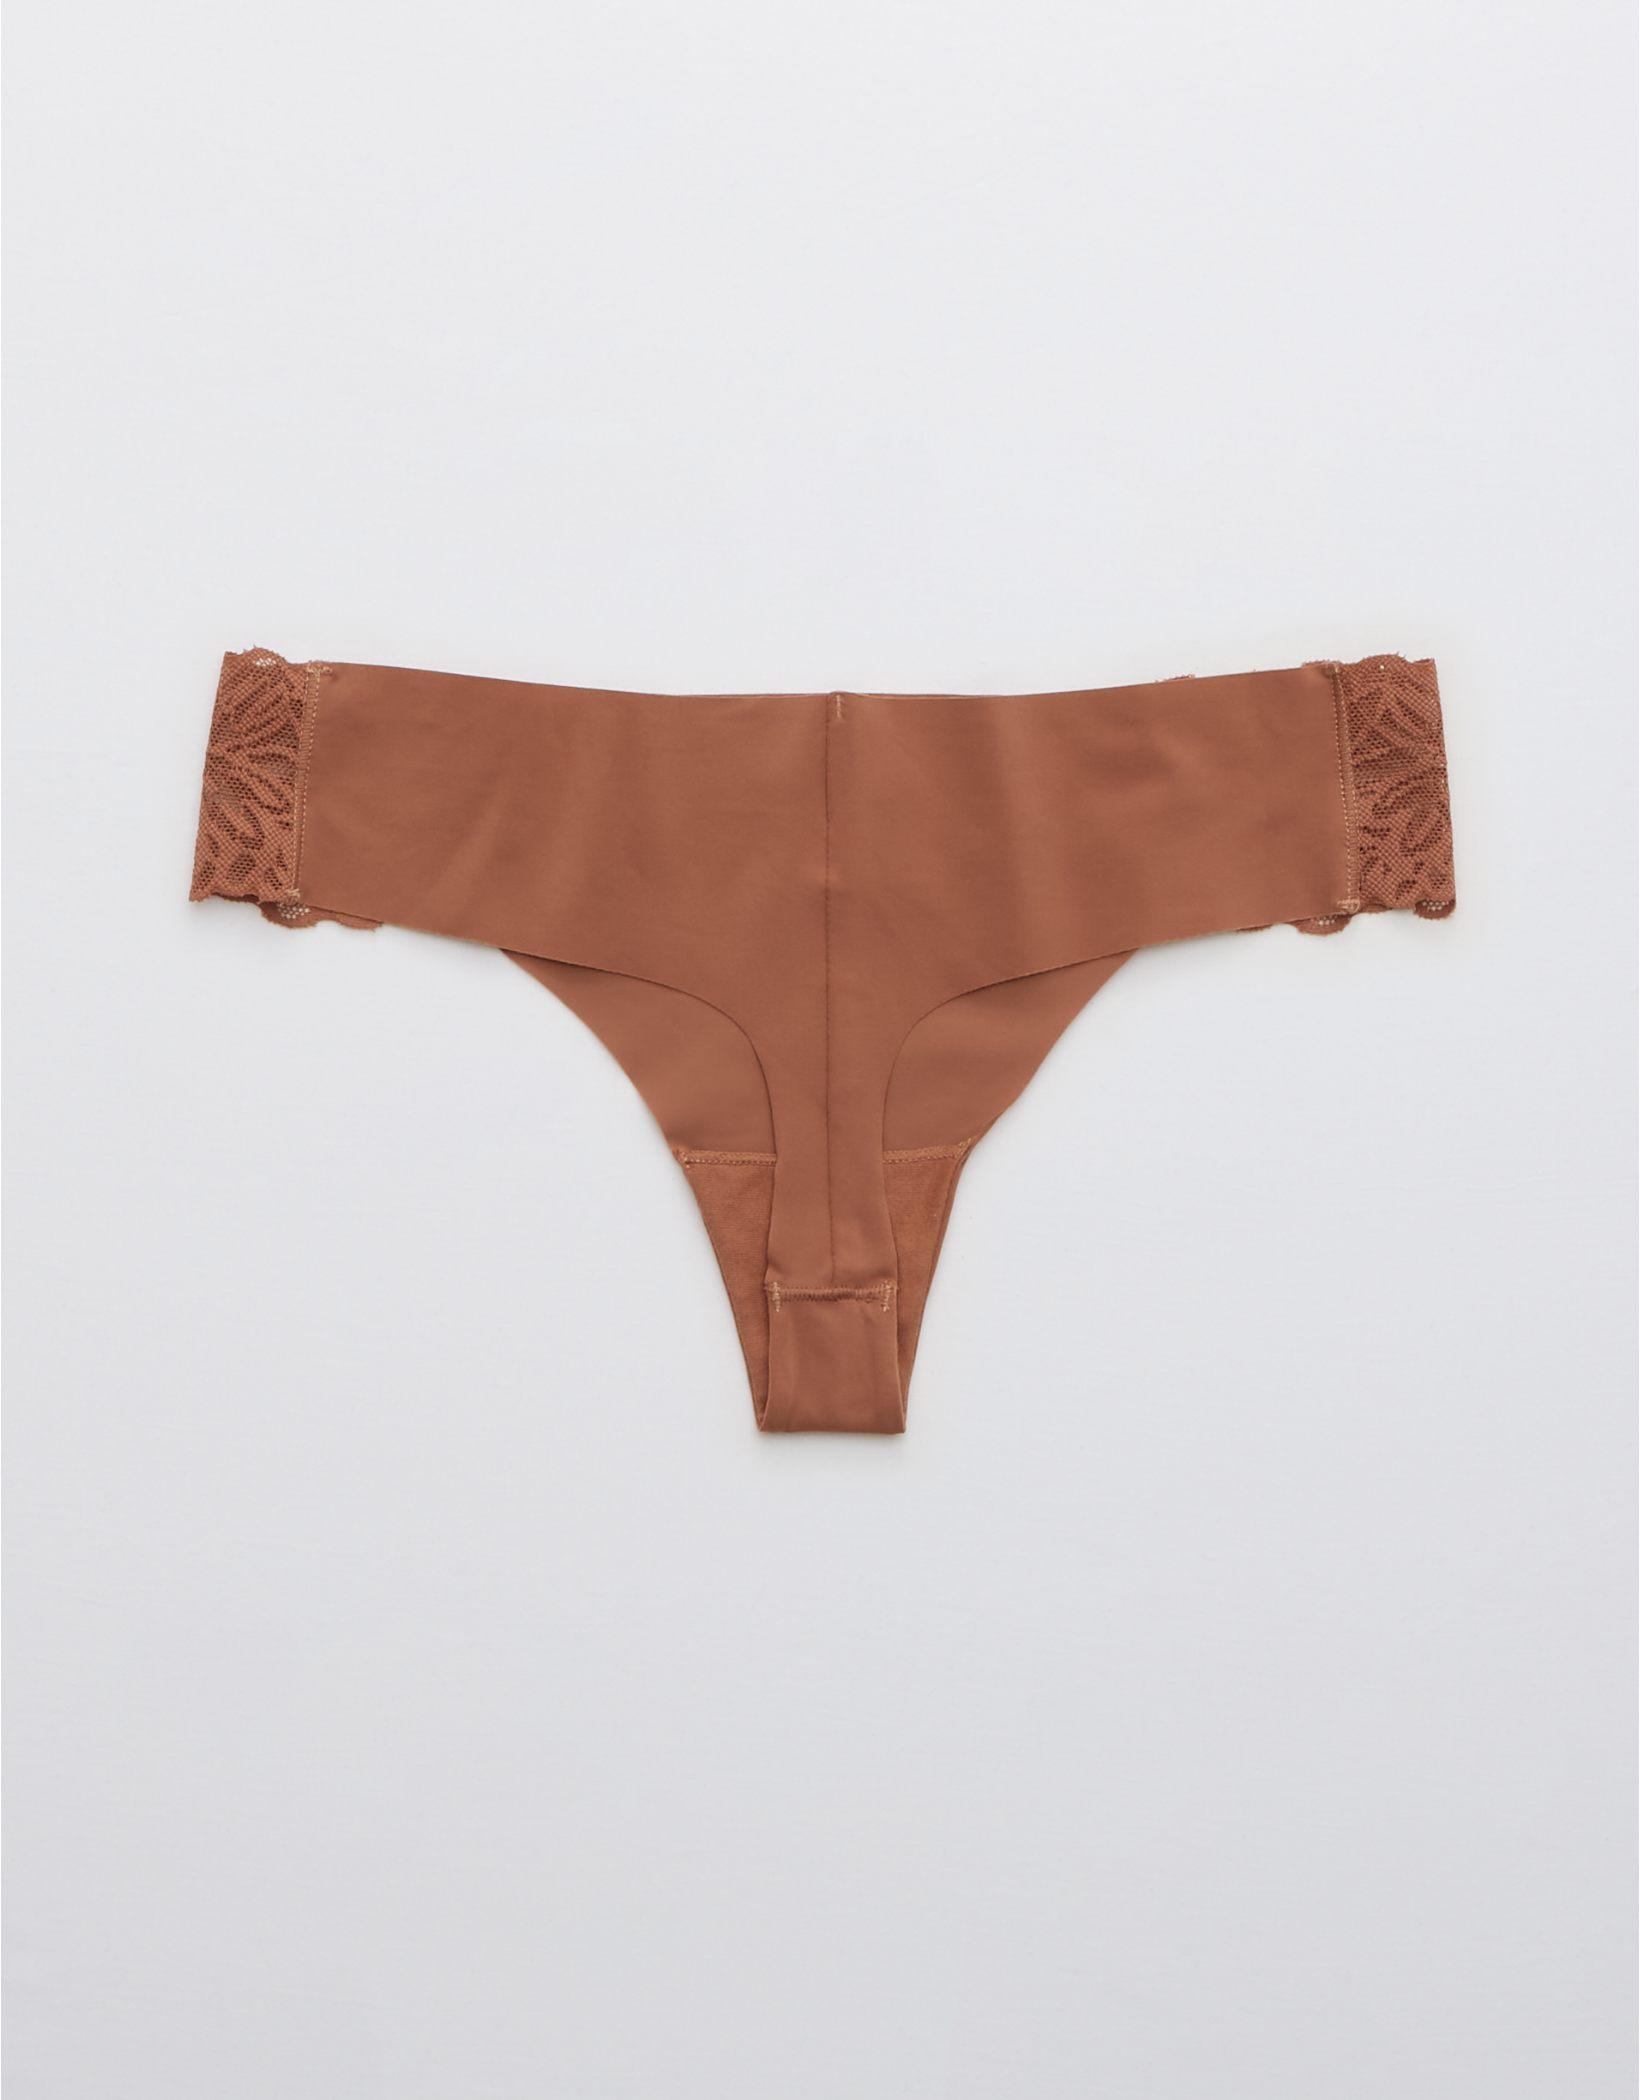 Aerie No Show Firework Lace Thong Underwear